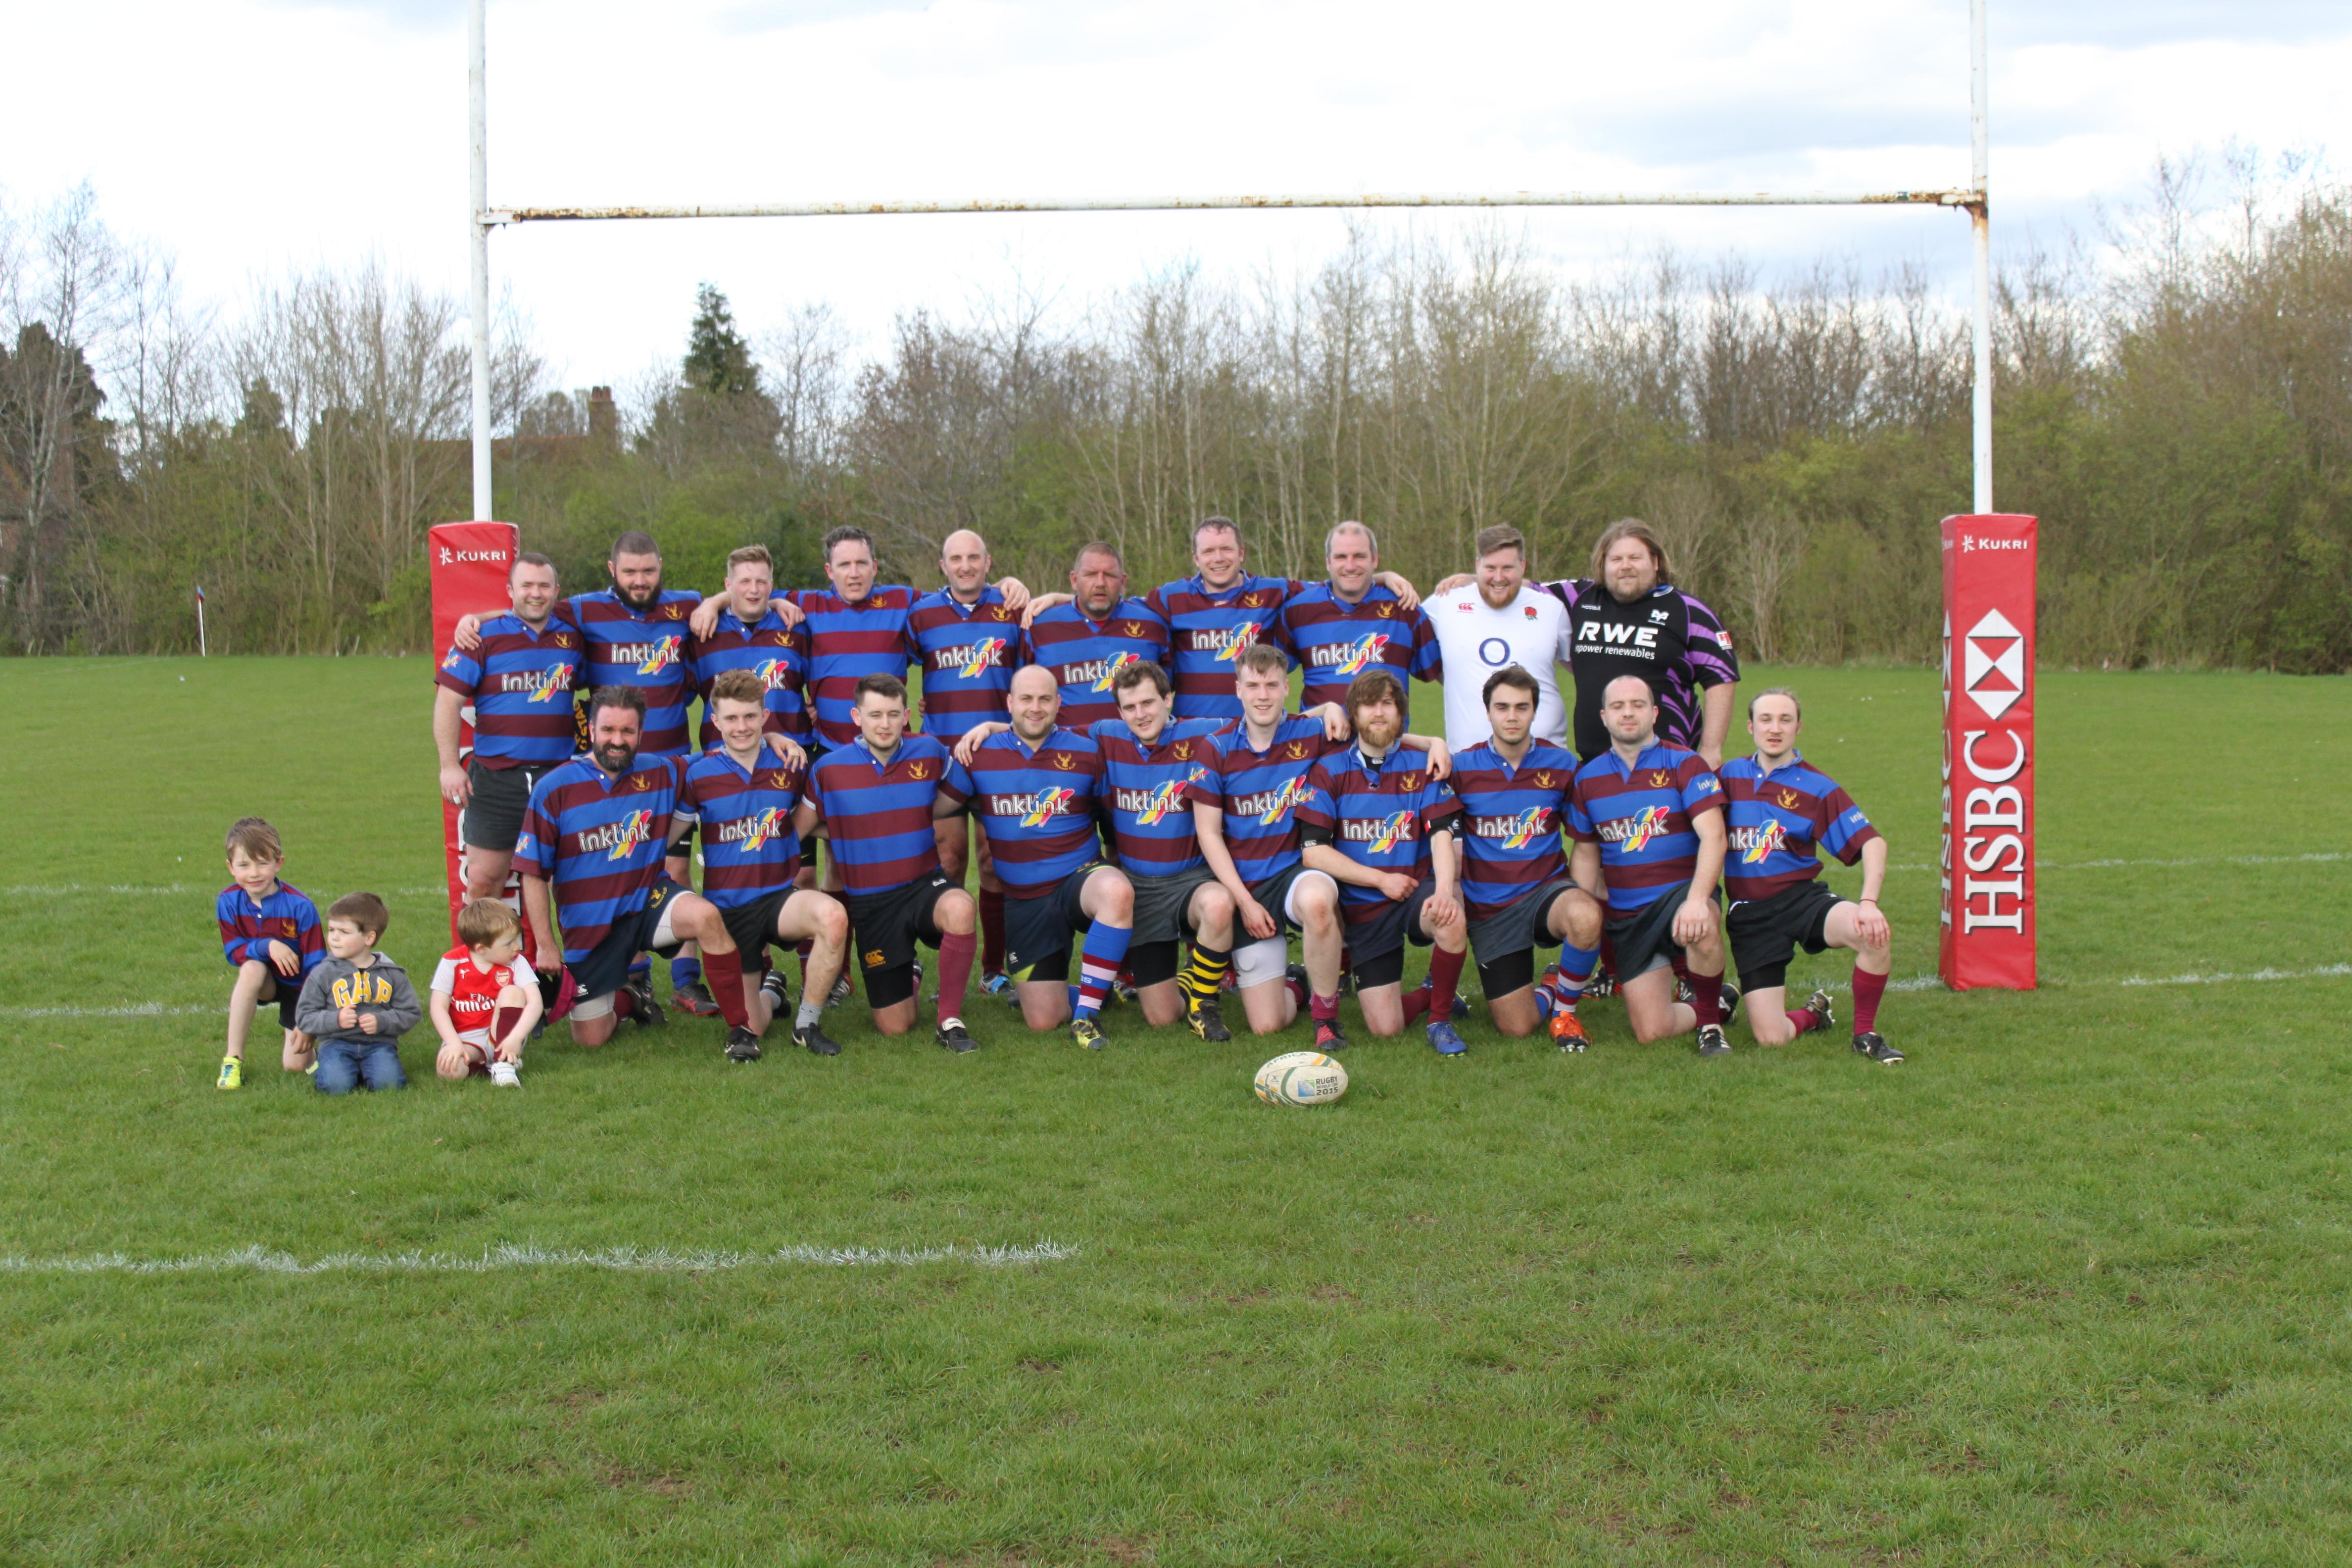 Chesham Rugby Club 32 vs  14 Hemel Hempstead 3rd XV - 13 October